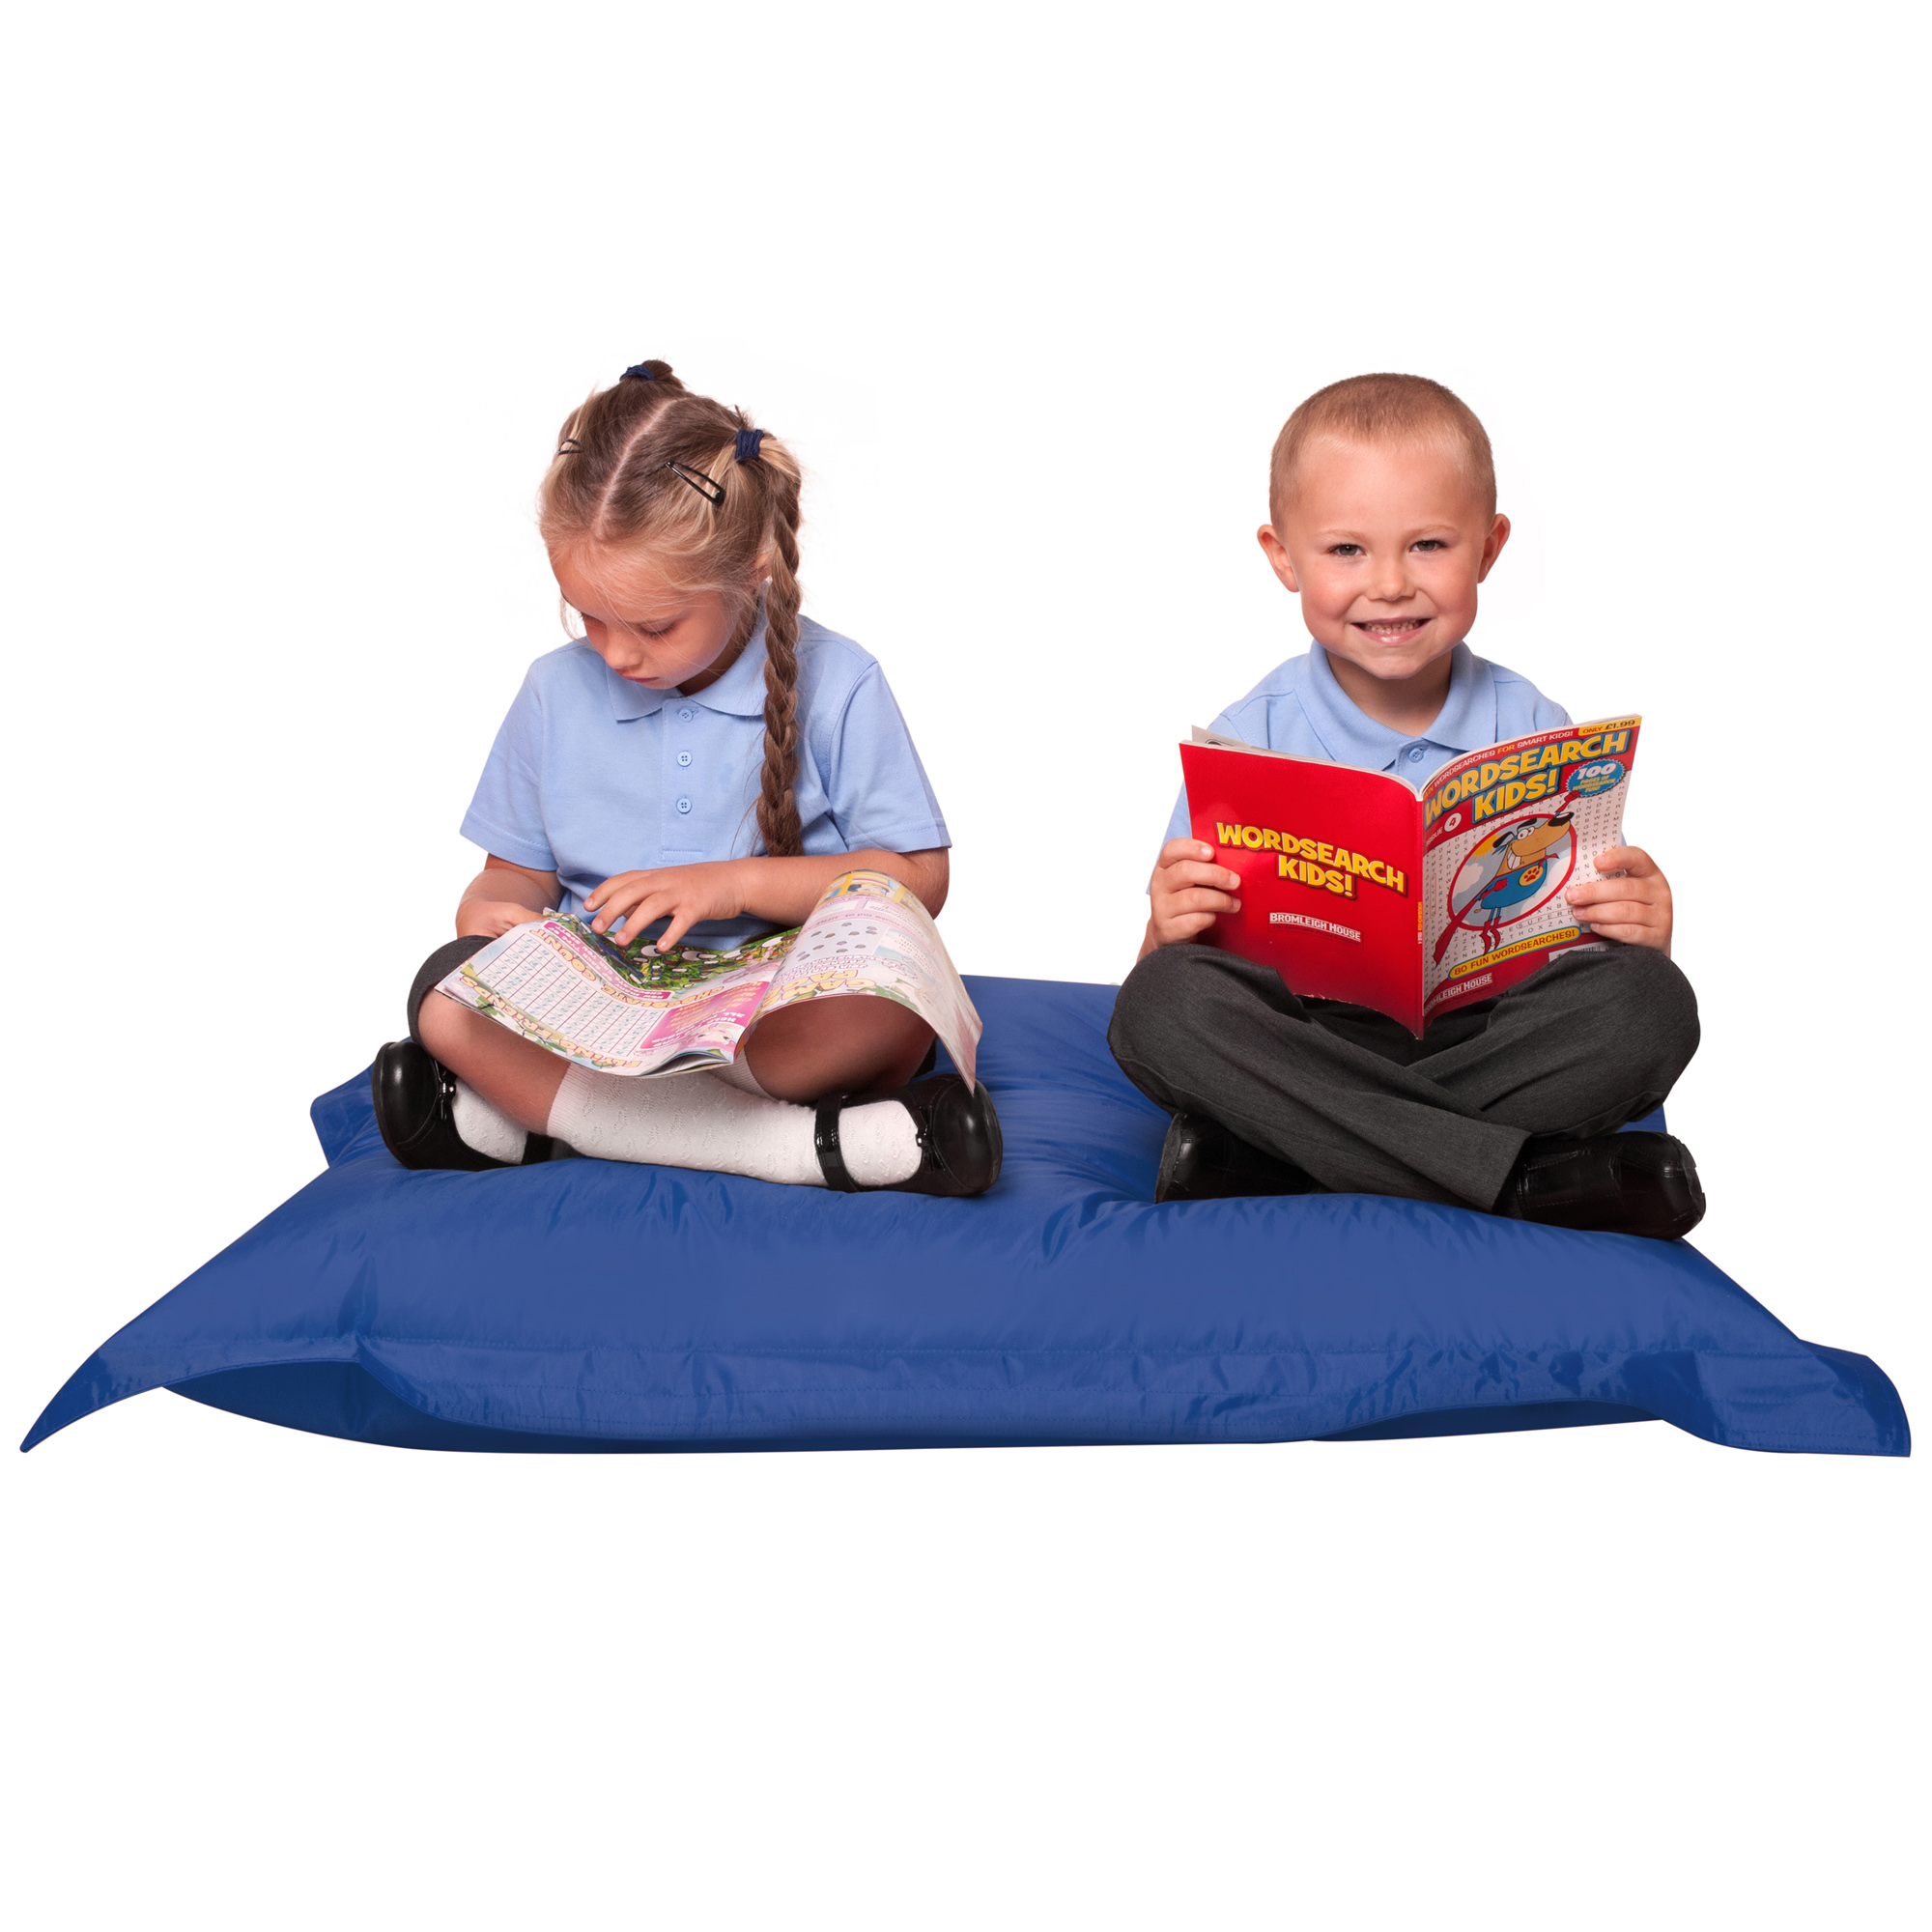 Eden-Childrens-Giant-Cushion-blue-300dpi-2